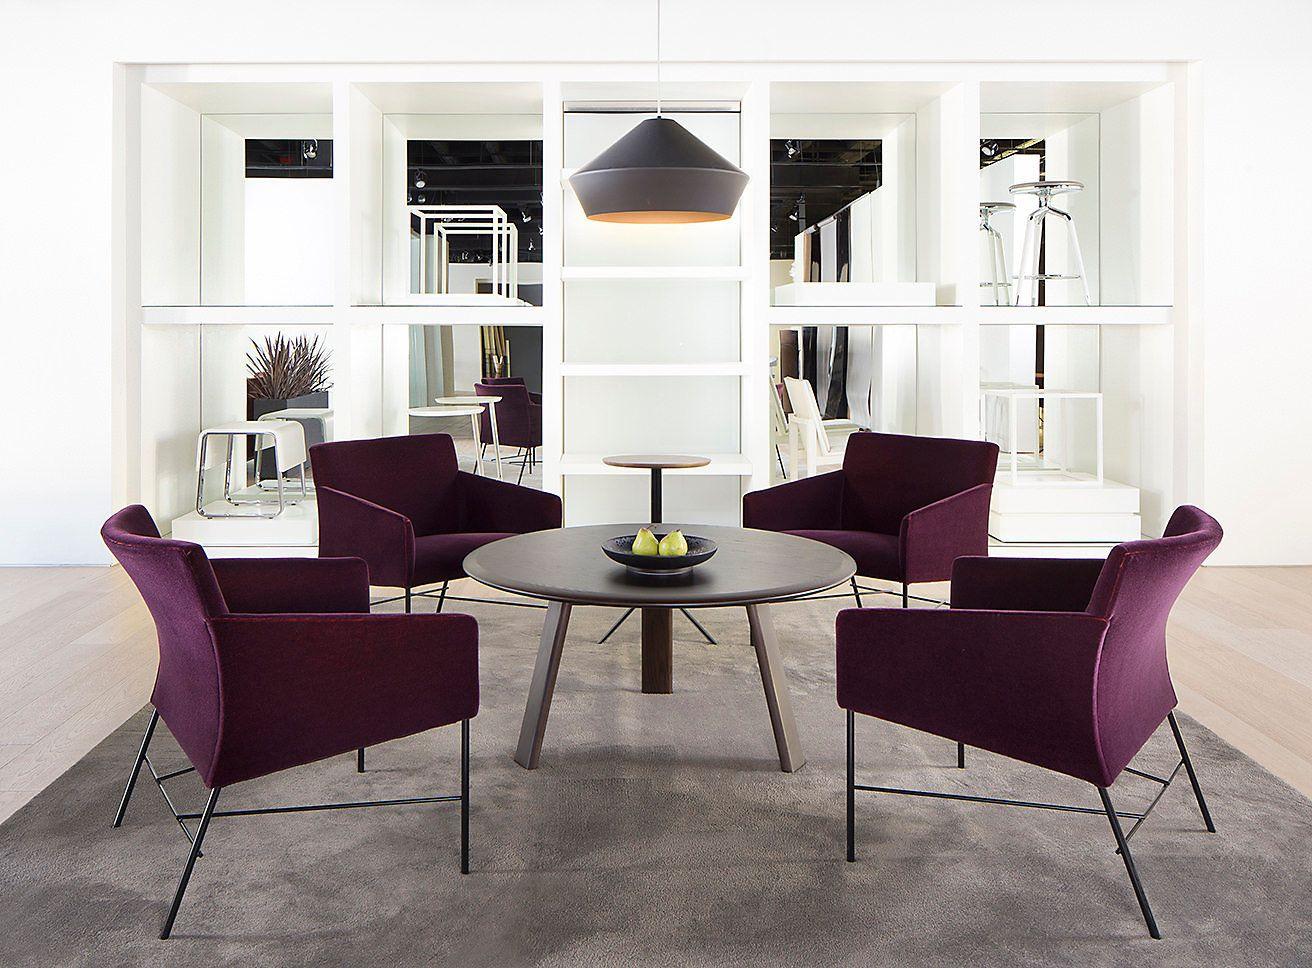 Hbf Furniture Hbf Inspiration Furniture Chair Contract Furniture